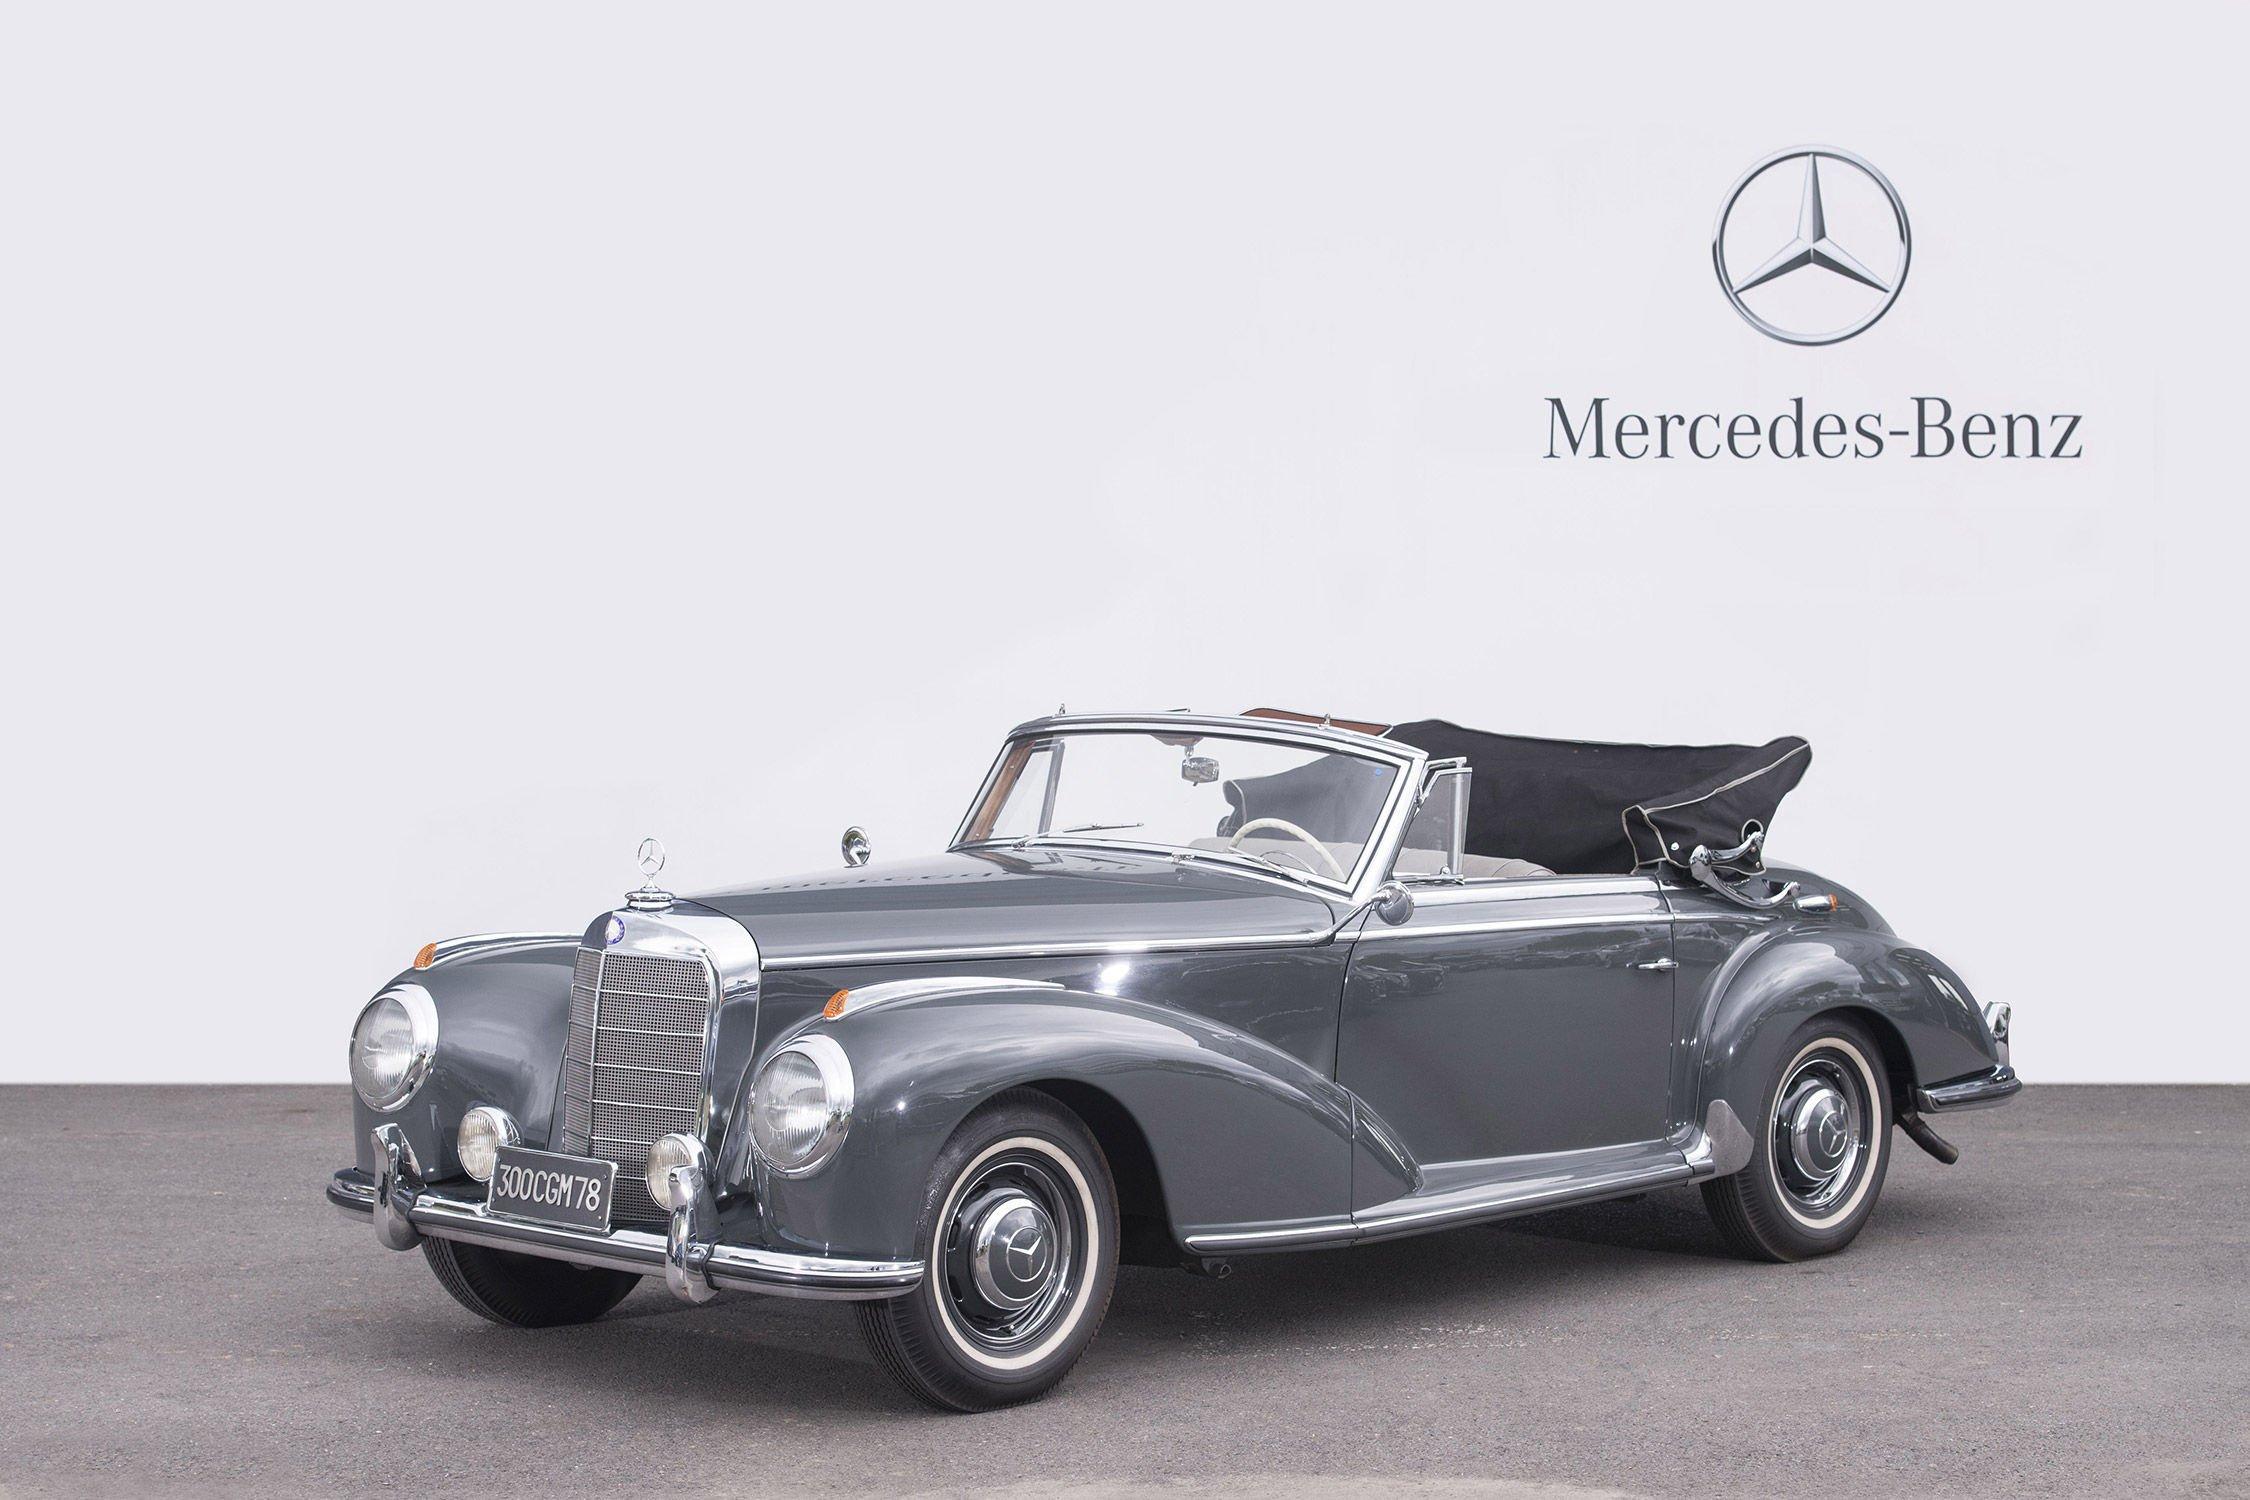 artcurial vente mercedes benz paris actualit automobile motorlegend. Black Bedroom Furniture Sets. Home Design Ideas